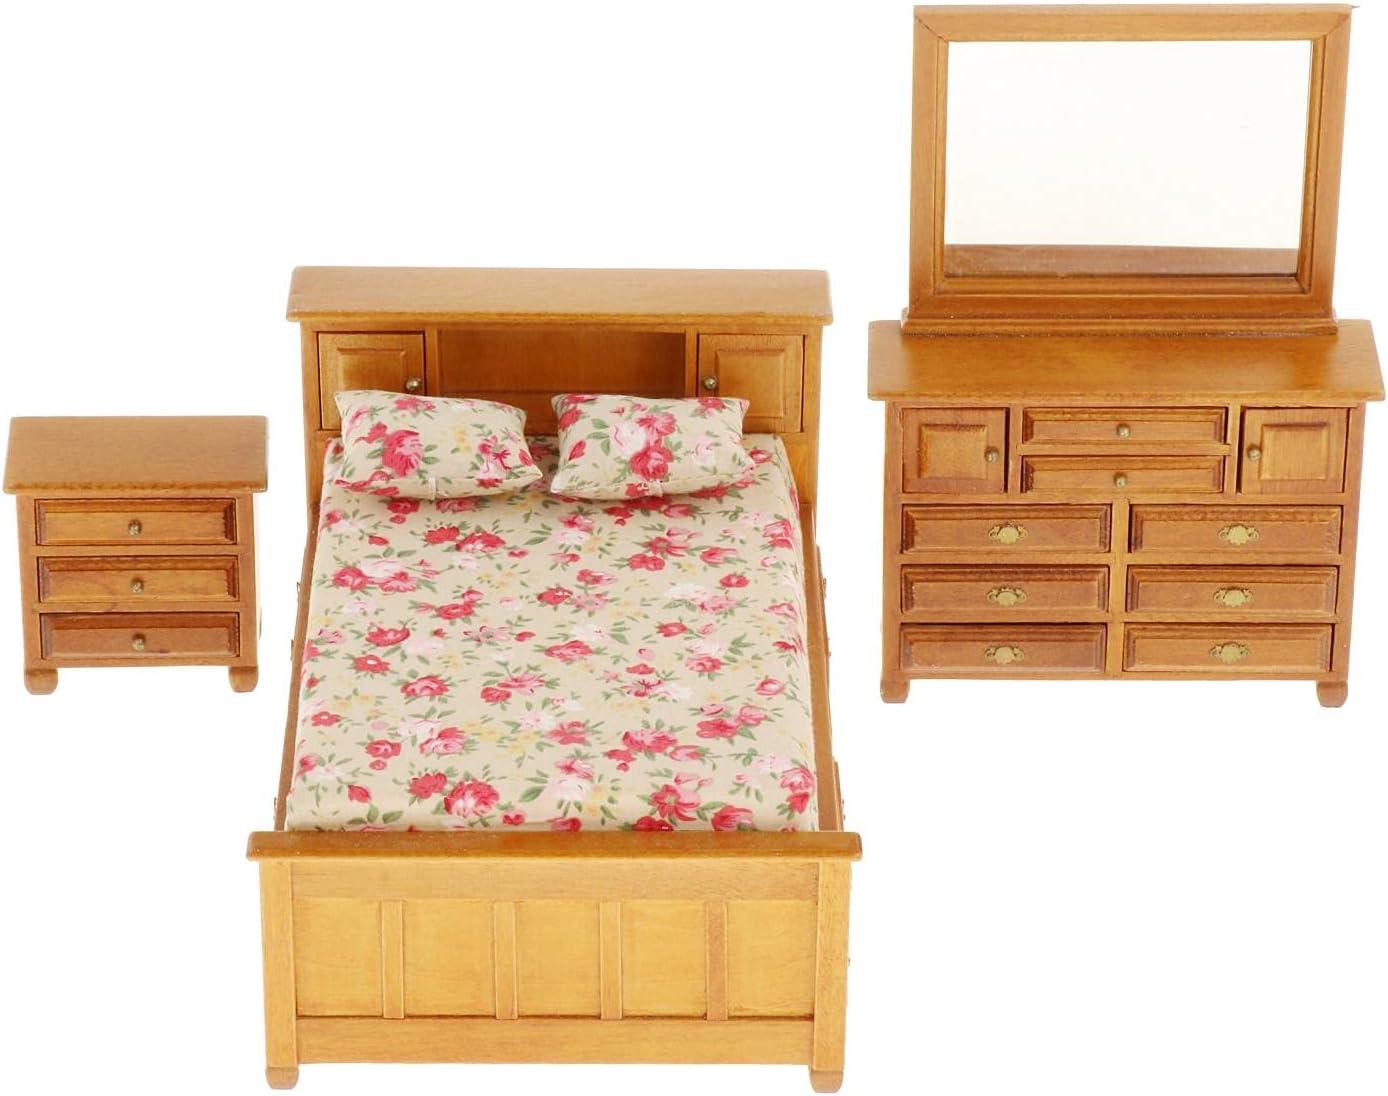 Almencla Miniature Handcraft Wood Stylish Bedroom Furniture 12th